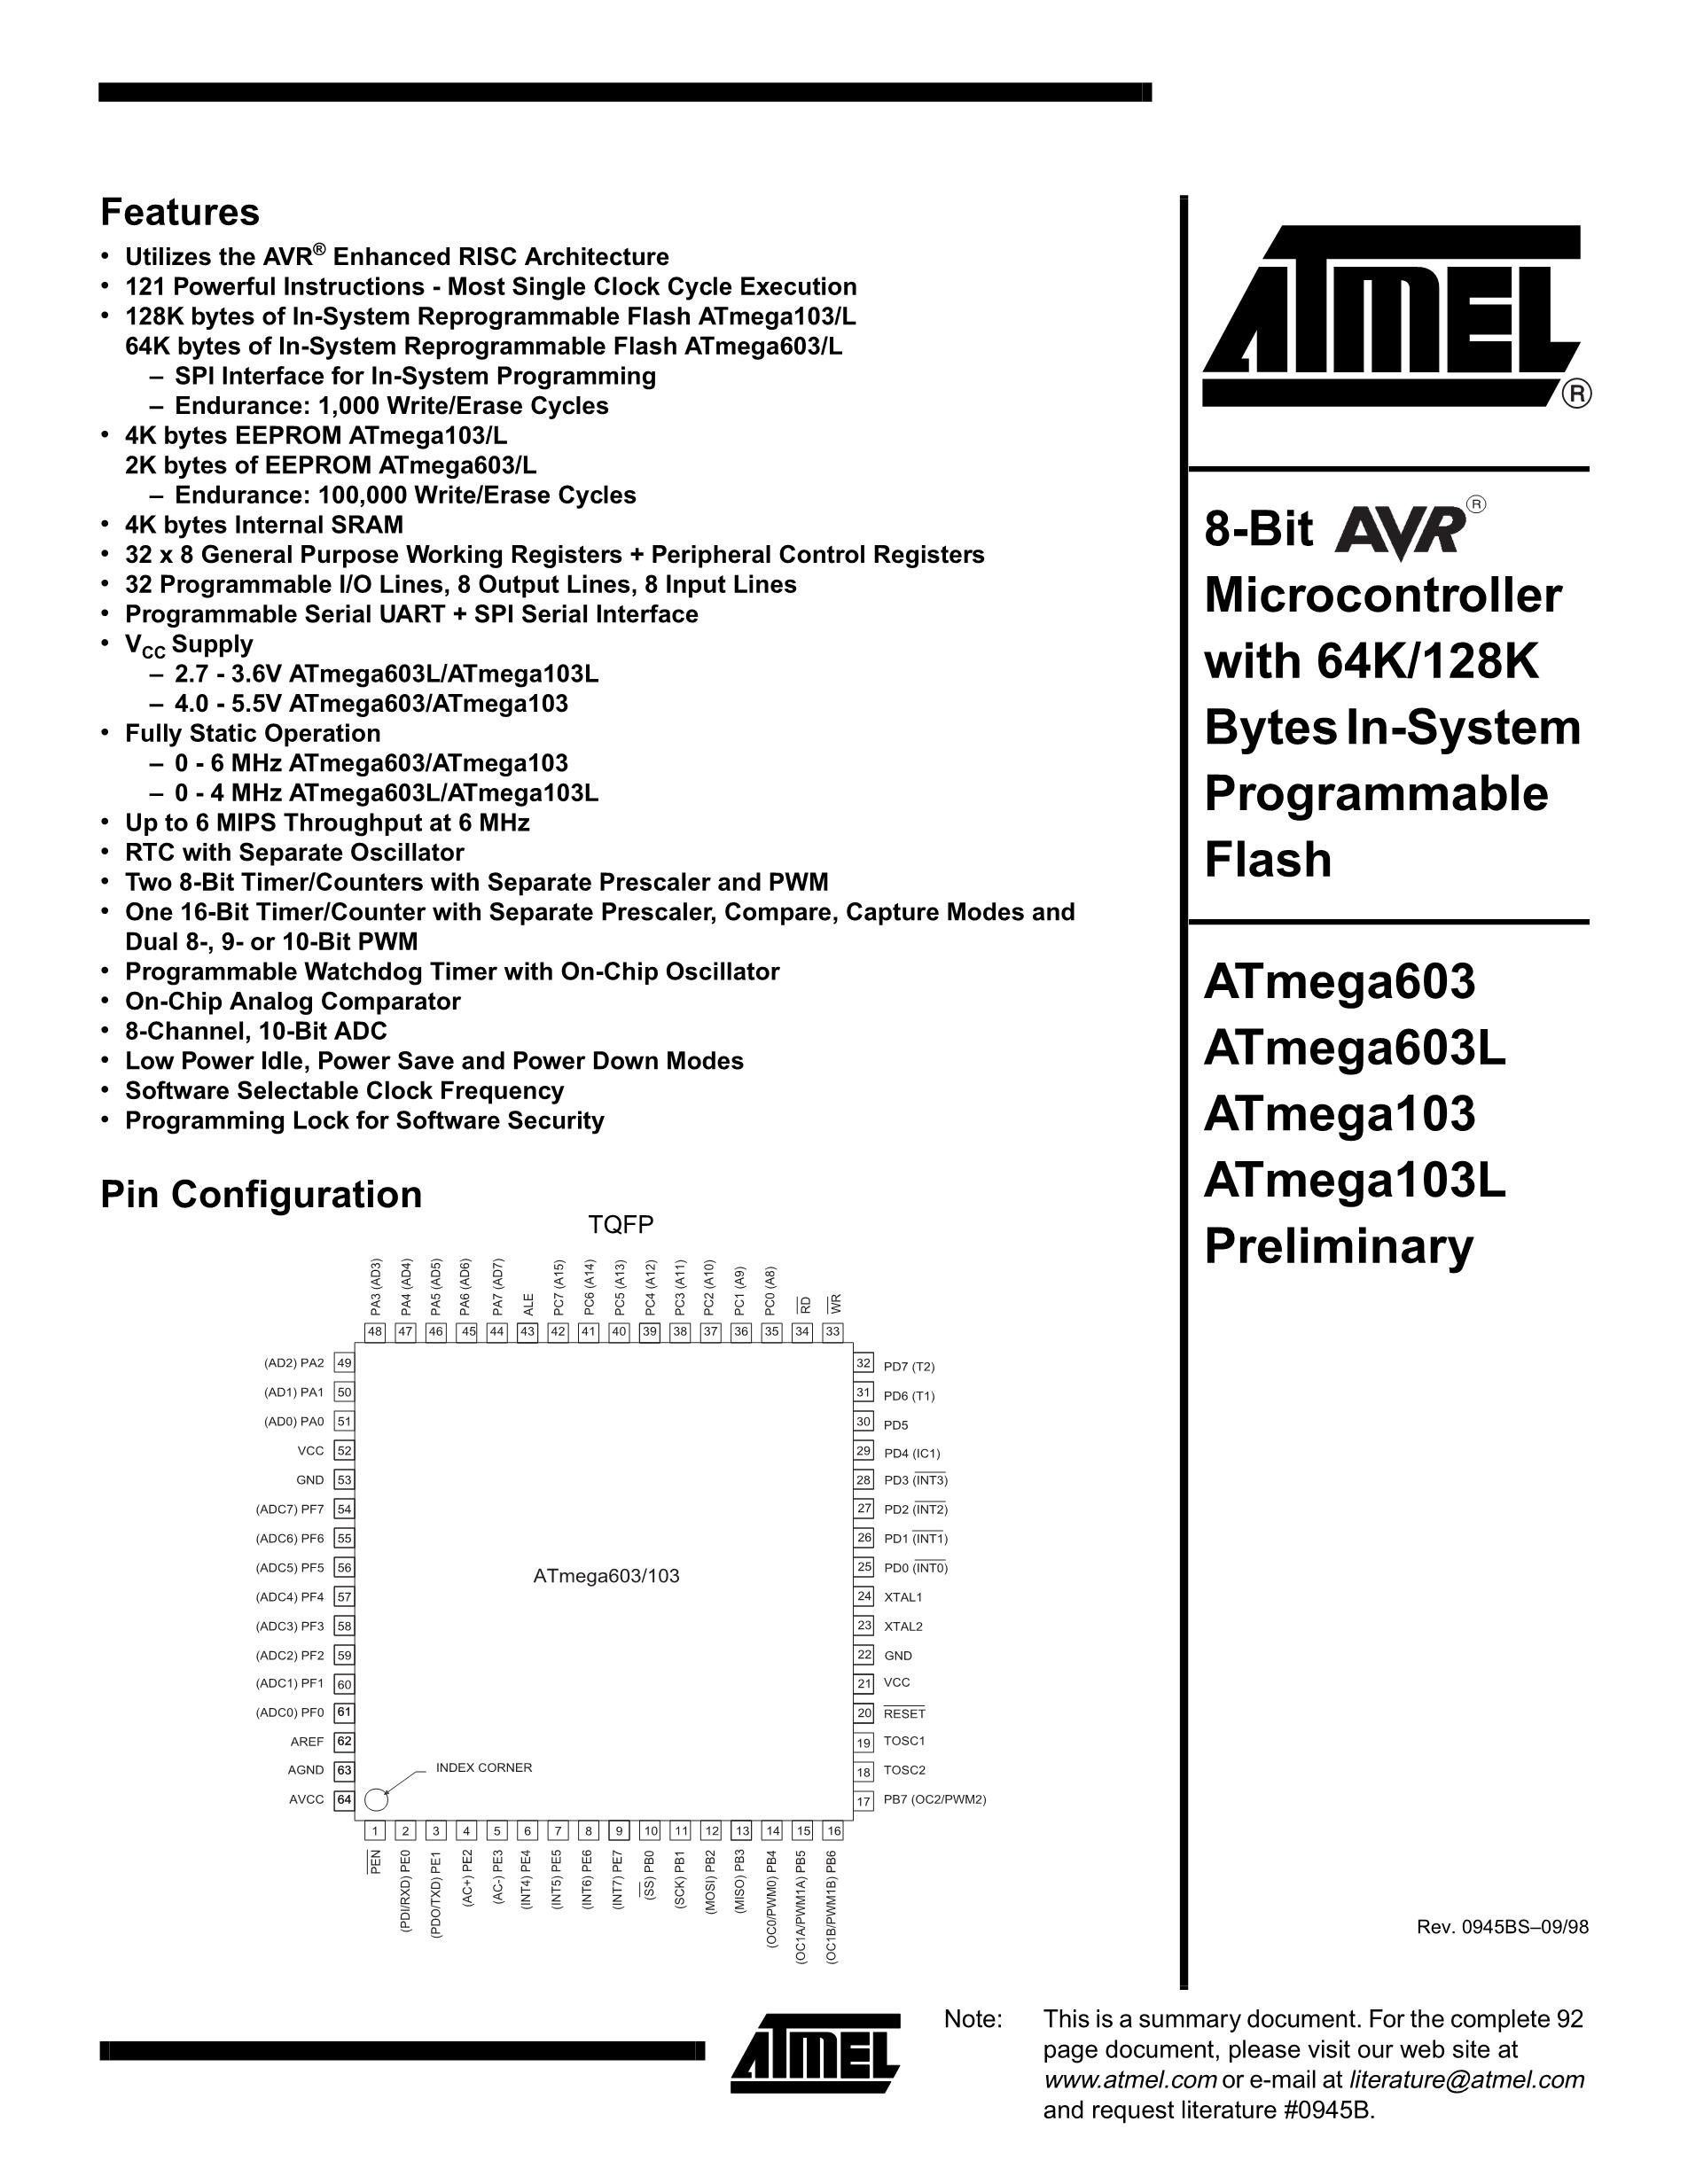 ATMEGA16U2-AU AVRVR ATMEGA8-BIT 16MHZ 16KB (8K X 16) FLASH 32-TQFP (7X7) 's pdf picture 1